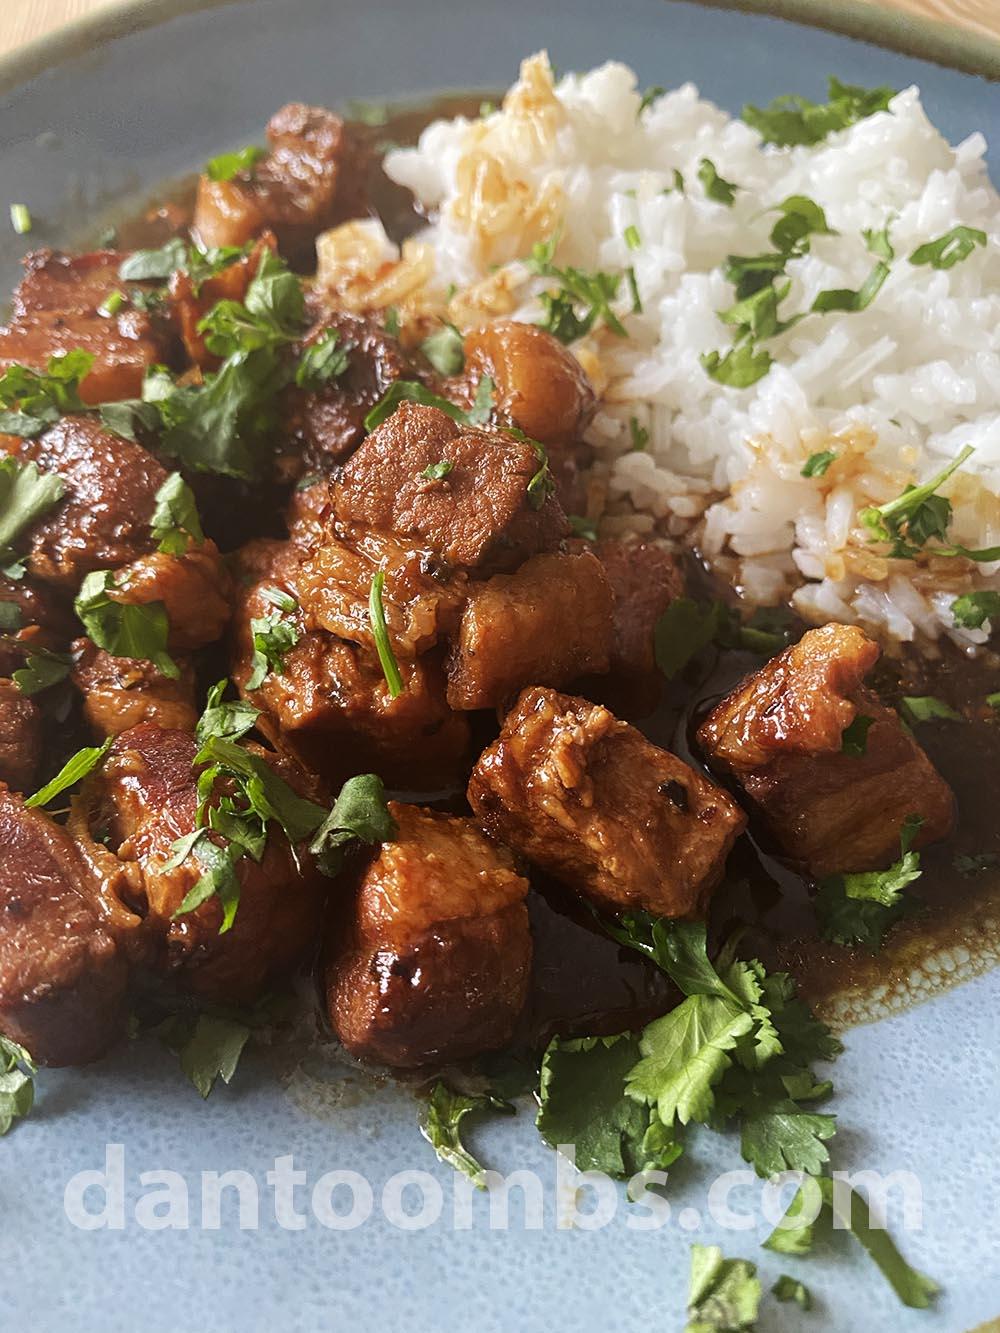 Moo hong - Thai pork belly stew